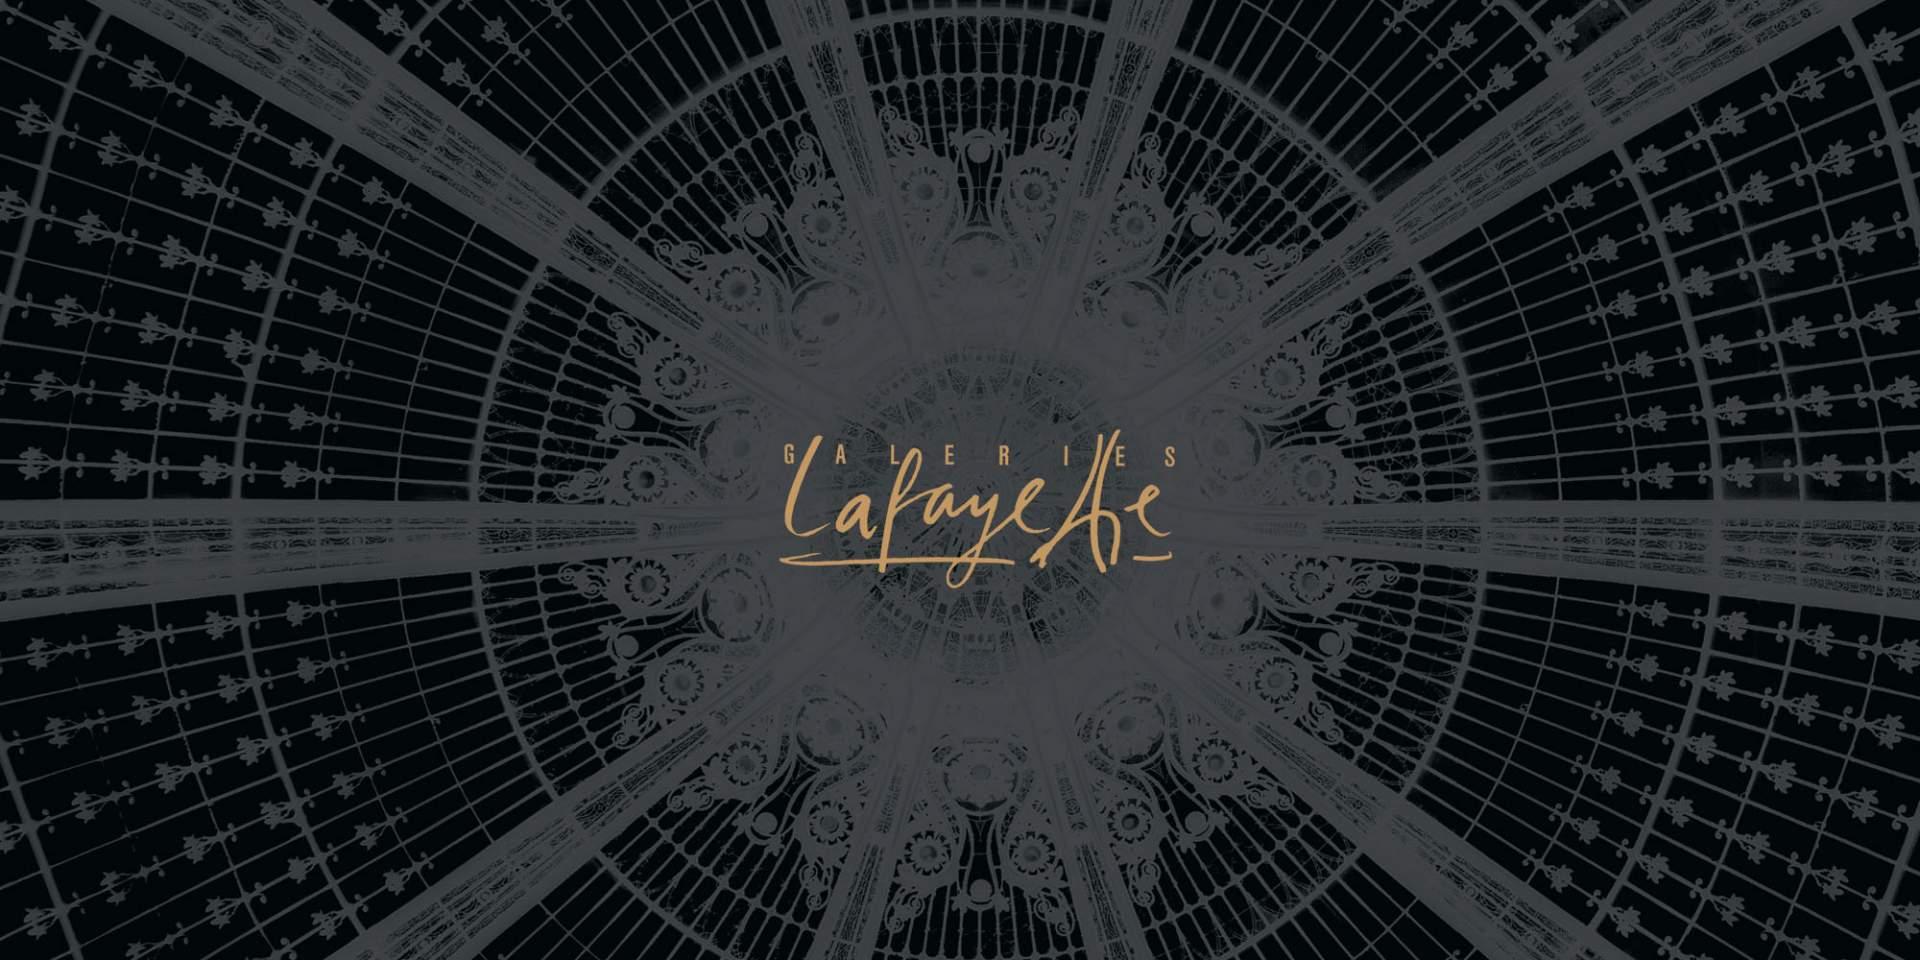 32-DA2 AGENCY-Galerie Lafayette 01